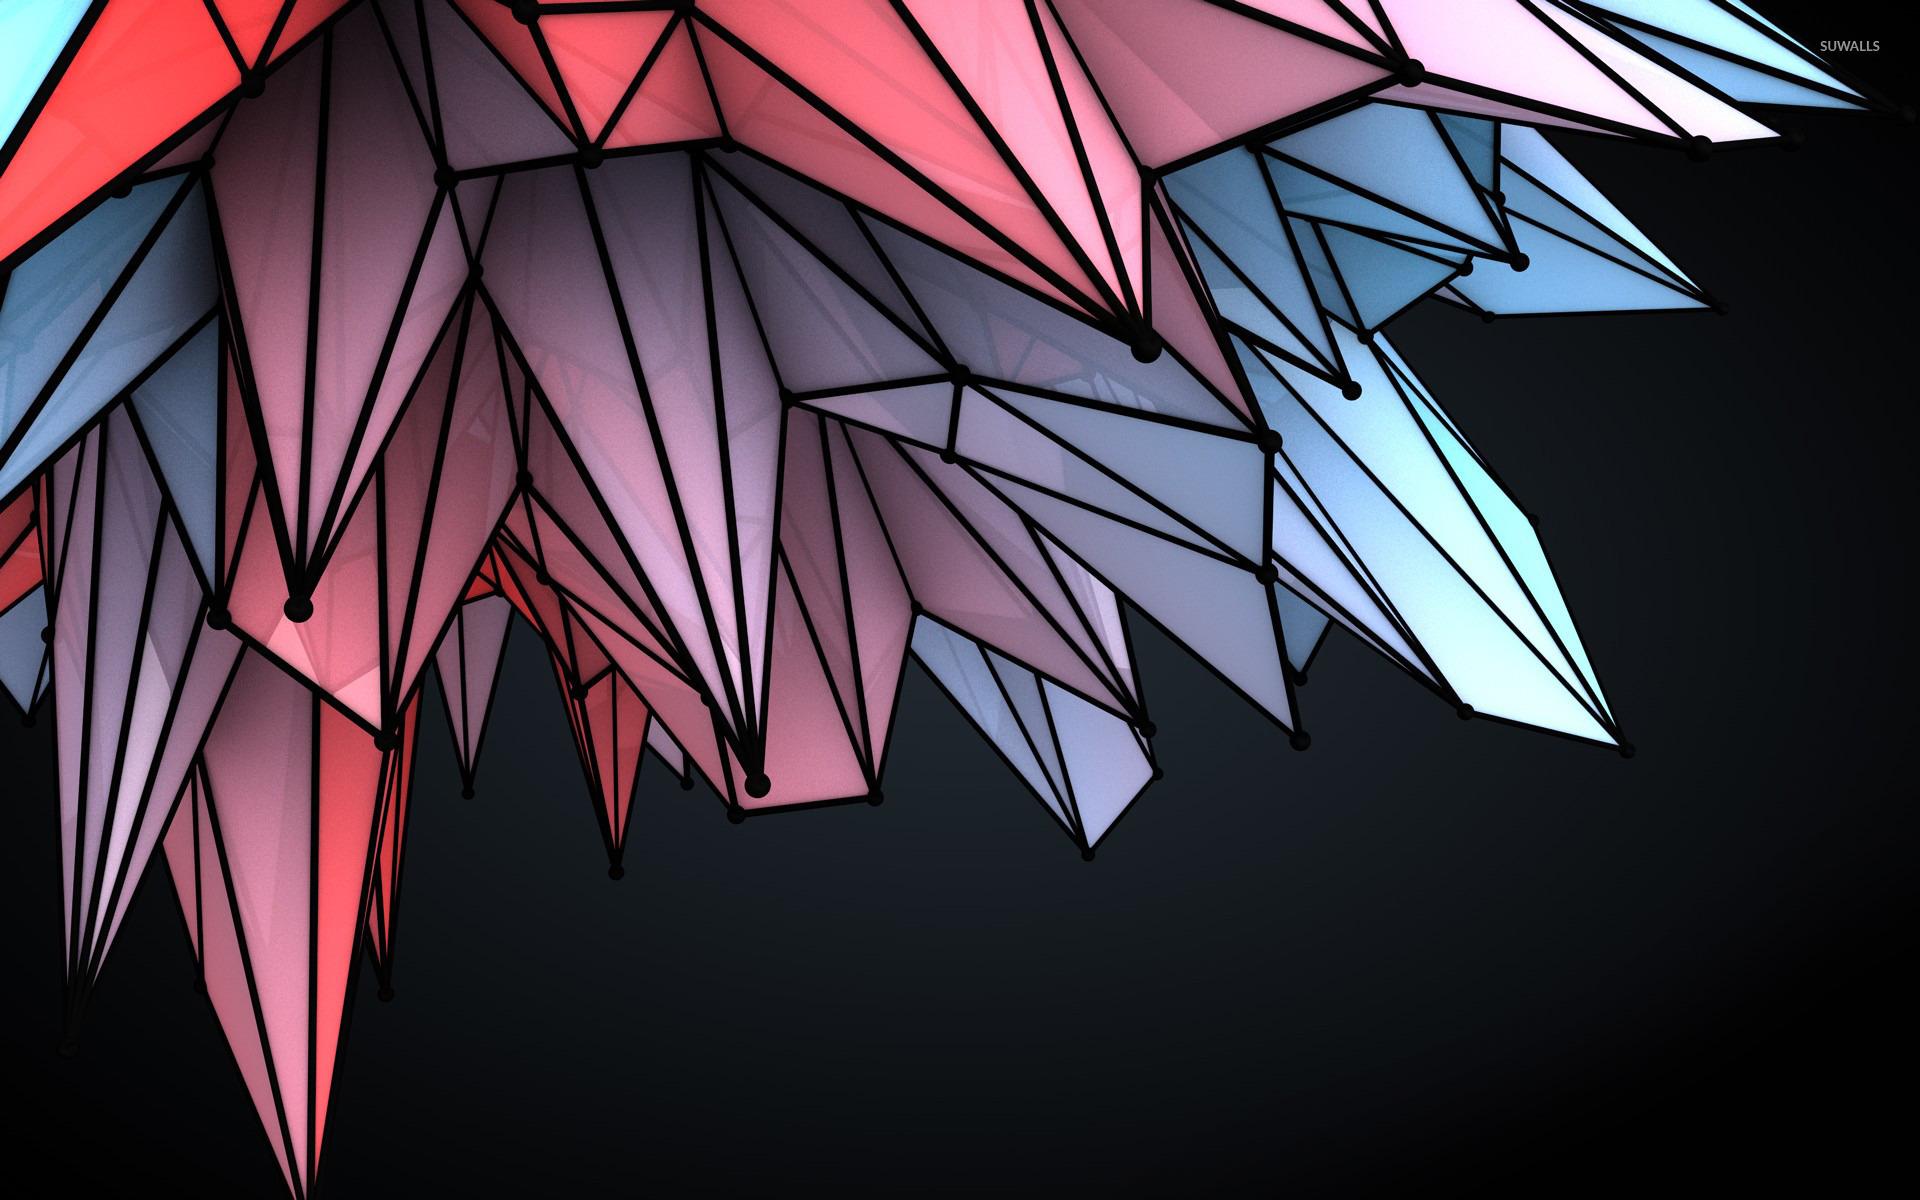 Colorful Crystals Wallpaper 1920x1200 Jpg